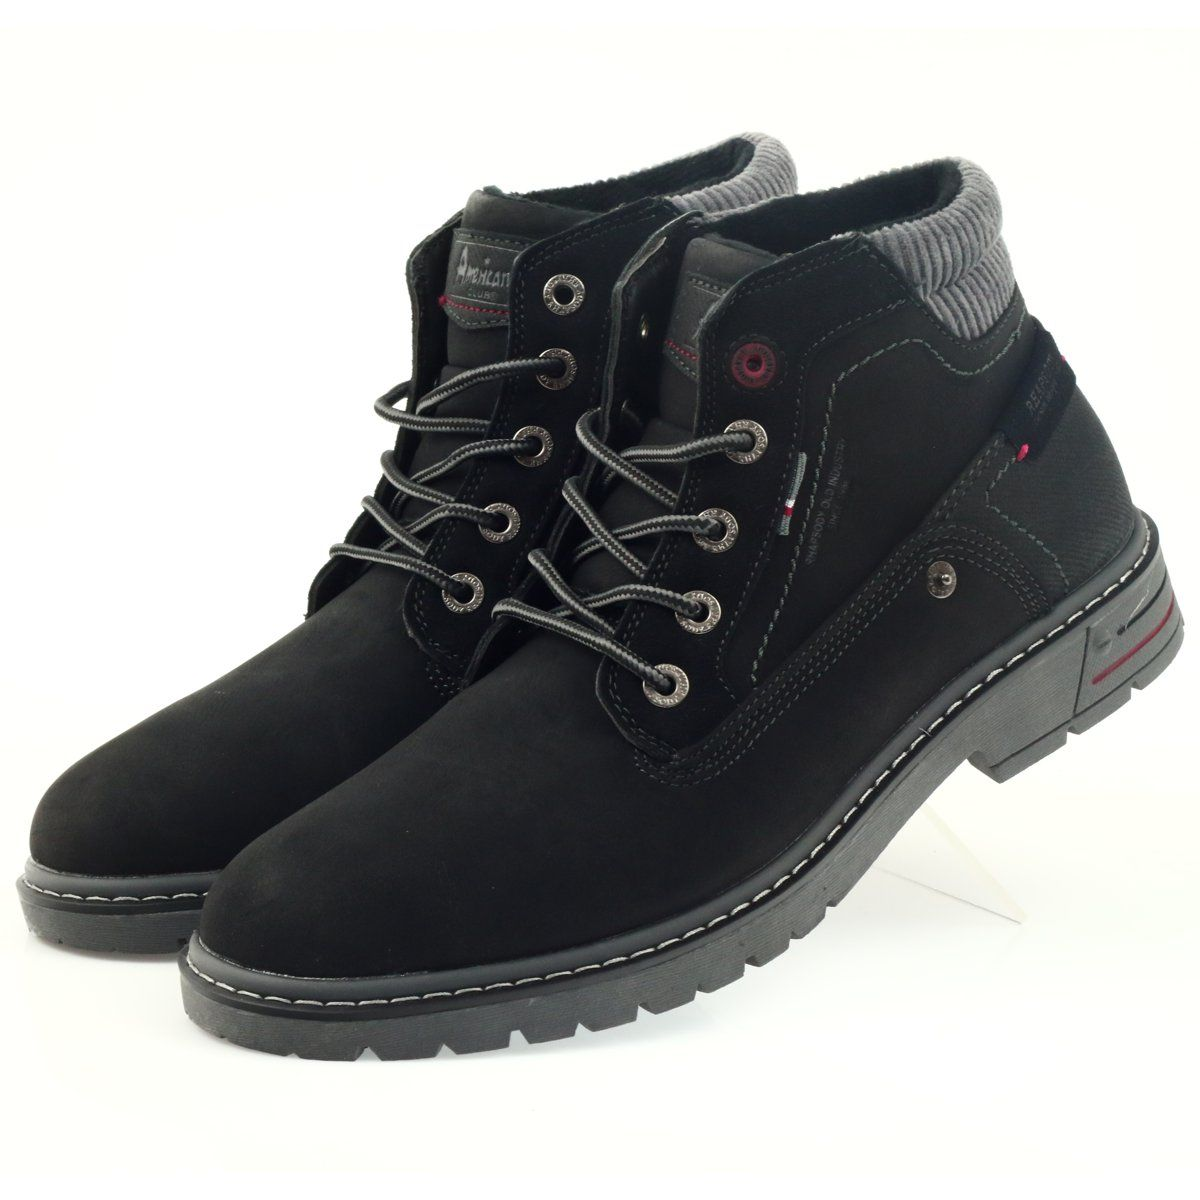 American Club American Trapery Buty Zimowe Trekkingi Czarne Boots Men Boots Trekking Shoes